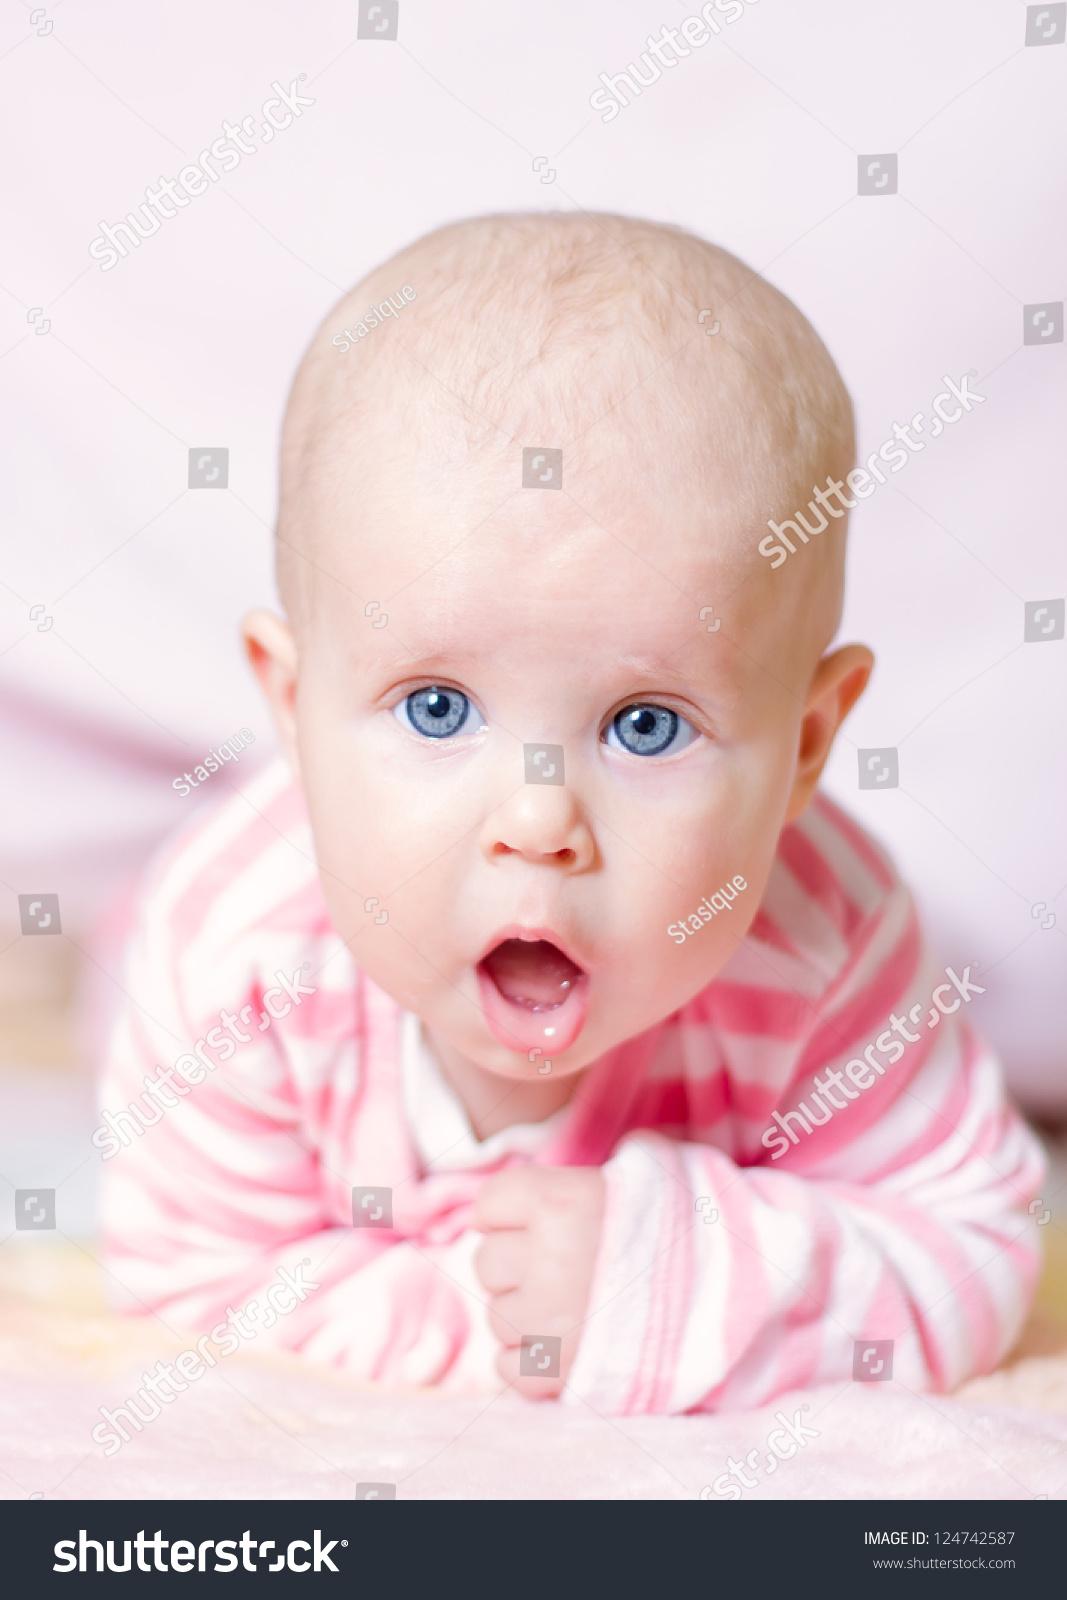 cute baby girl with big blue eyes lying down | ez canvas